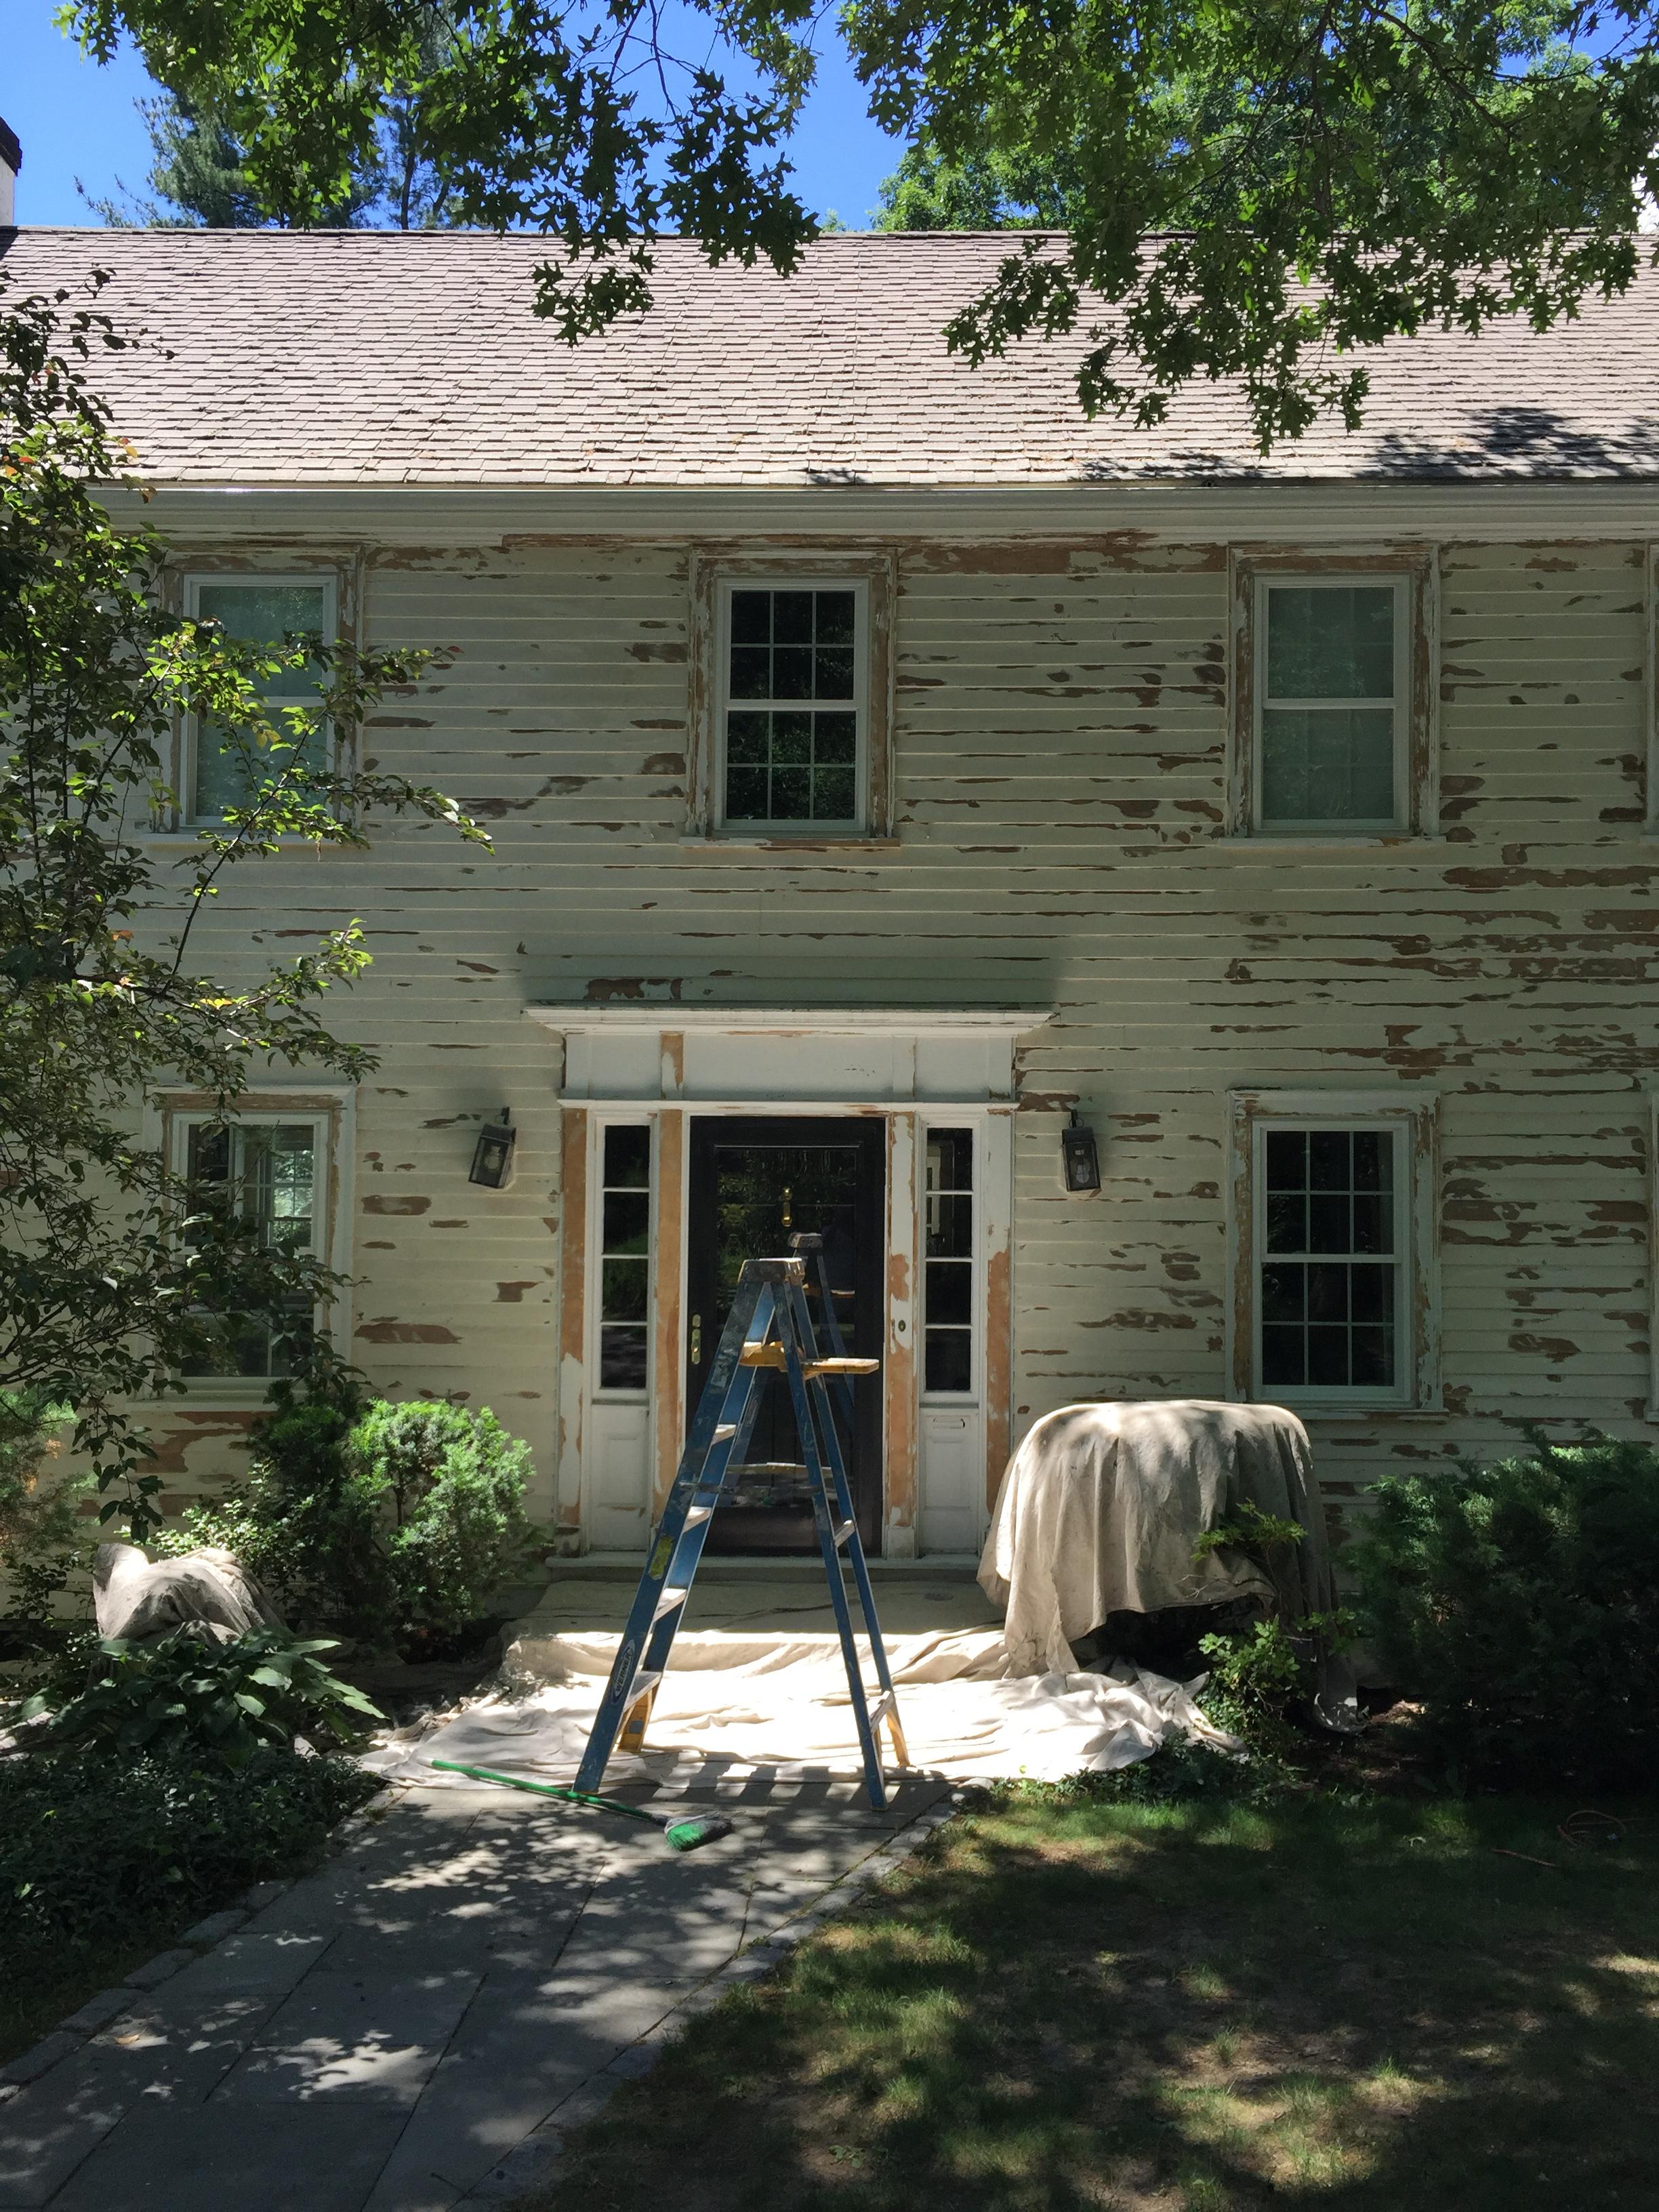 Preparation - Thorough sanding